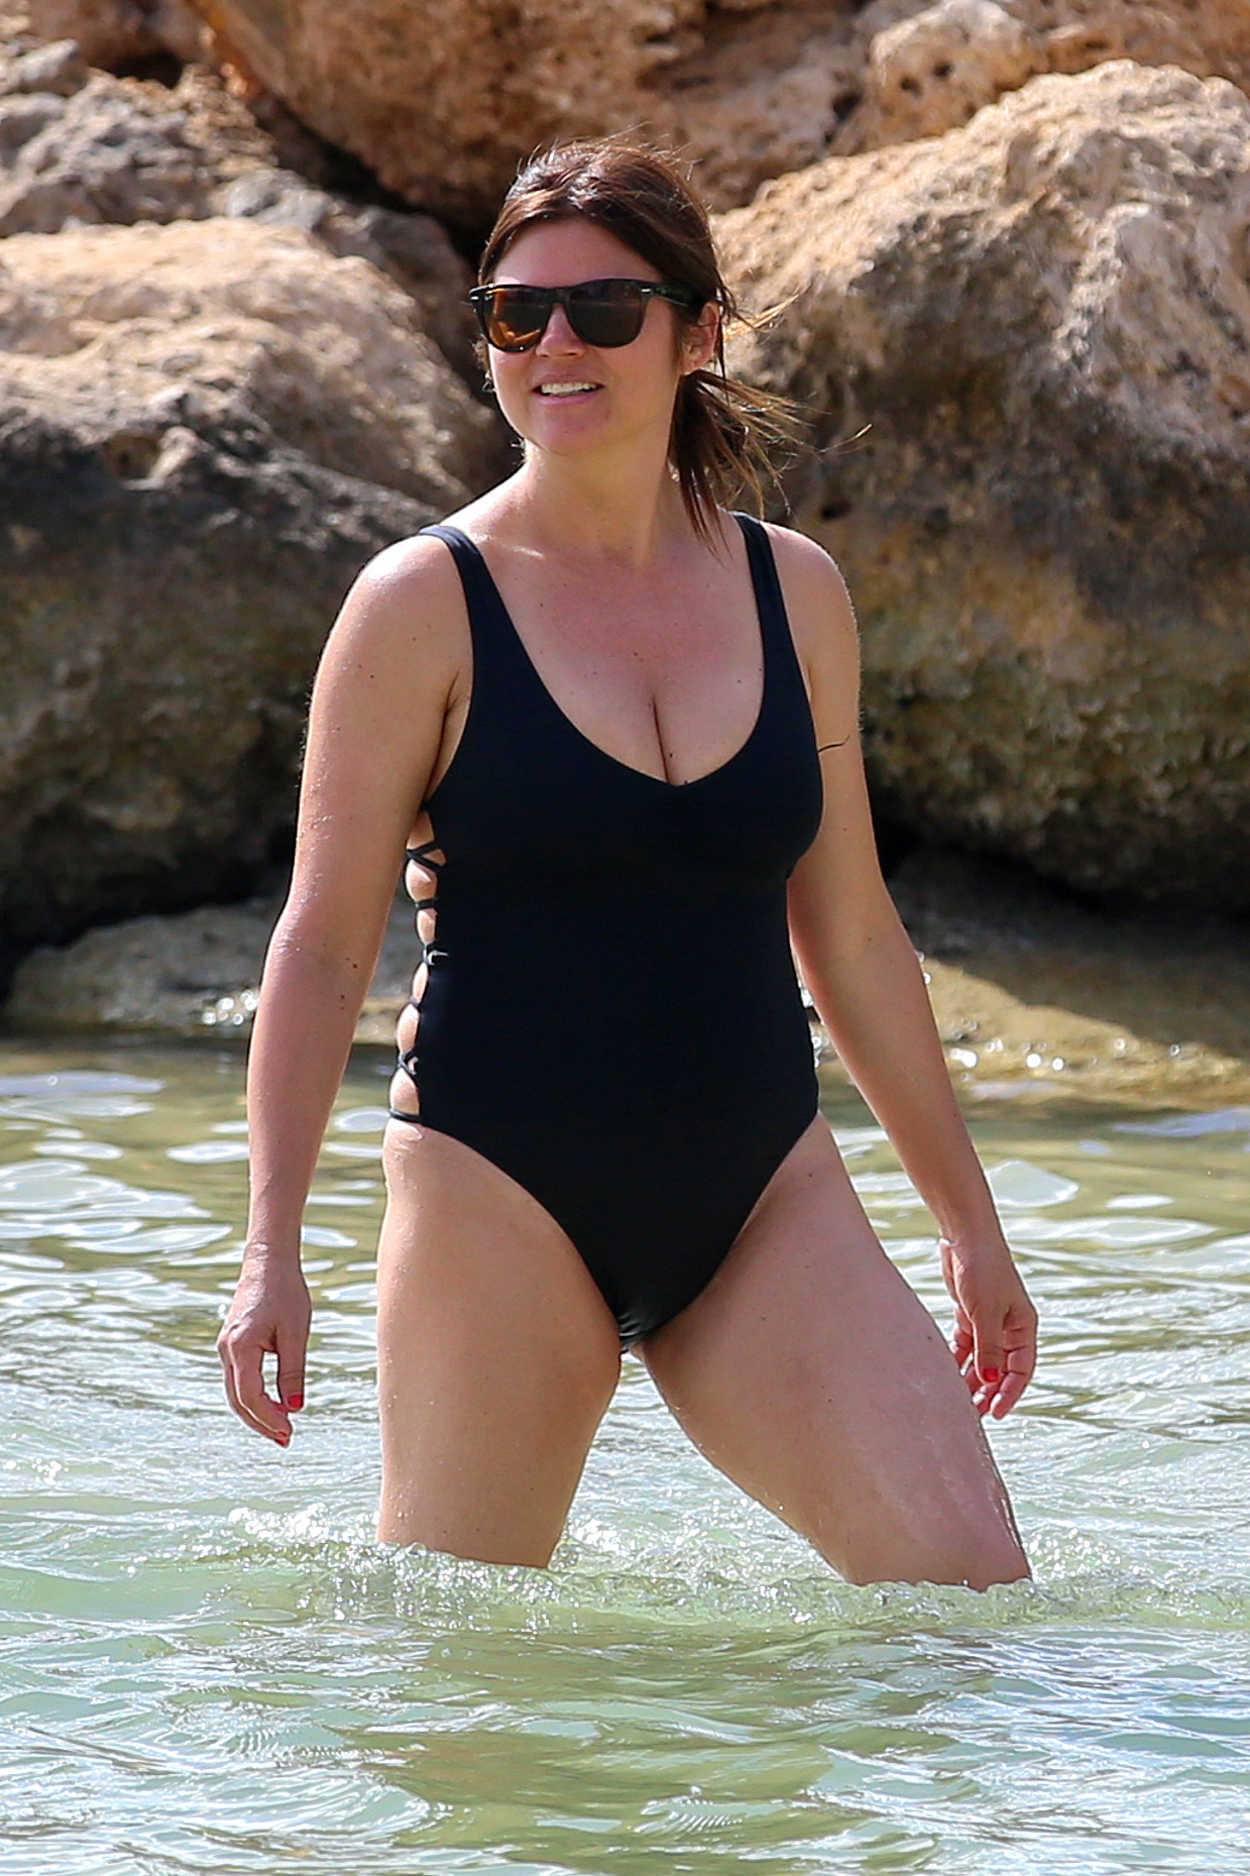 Tiffani Thiessen Wearing a Black Swimsuit at the Beach in ... Victoria Beckham Target